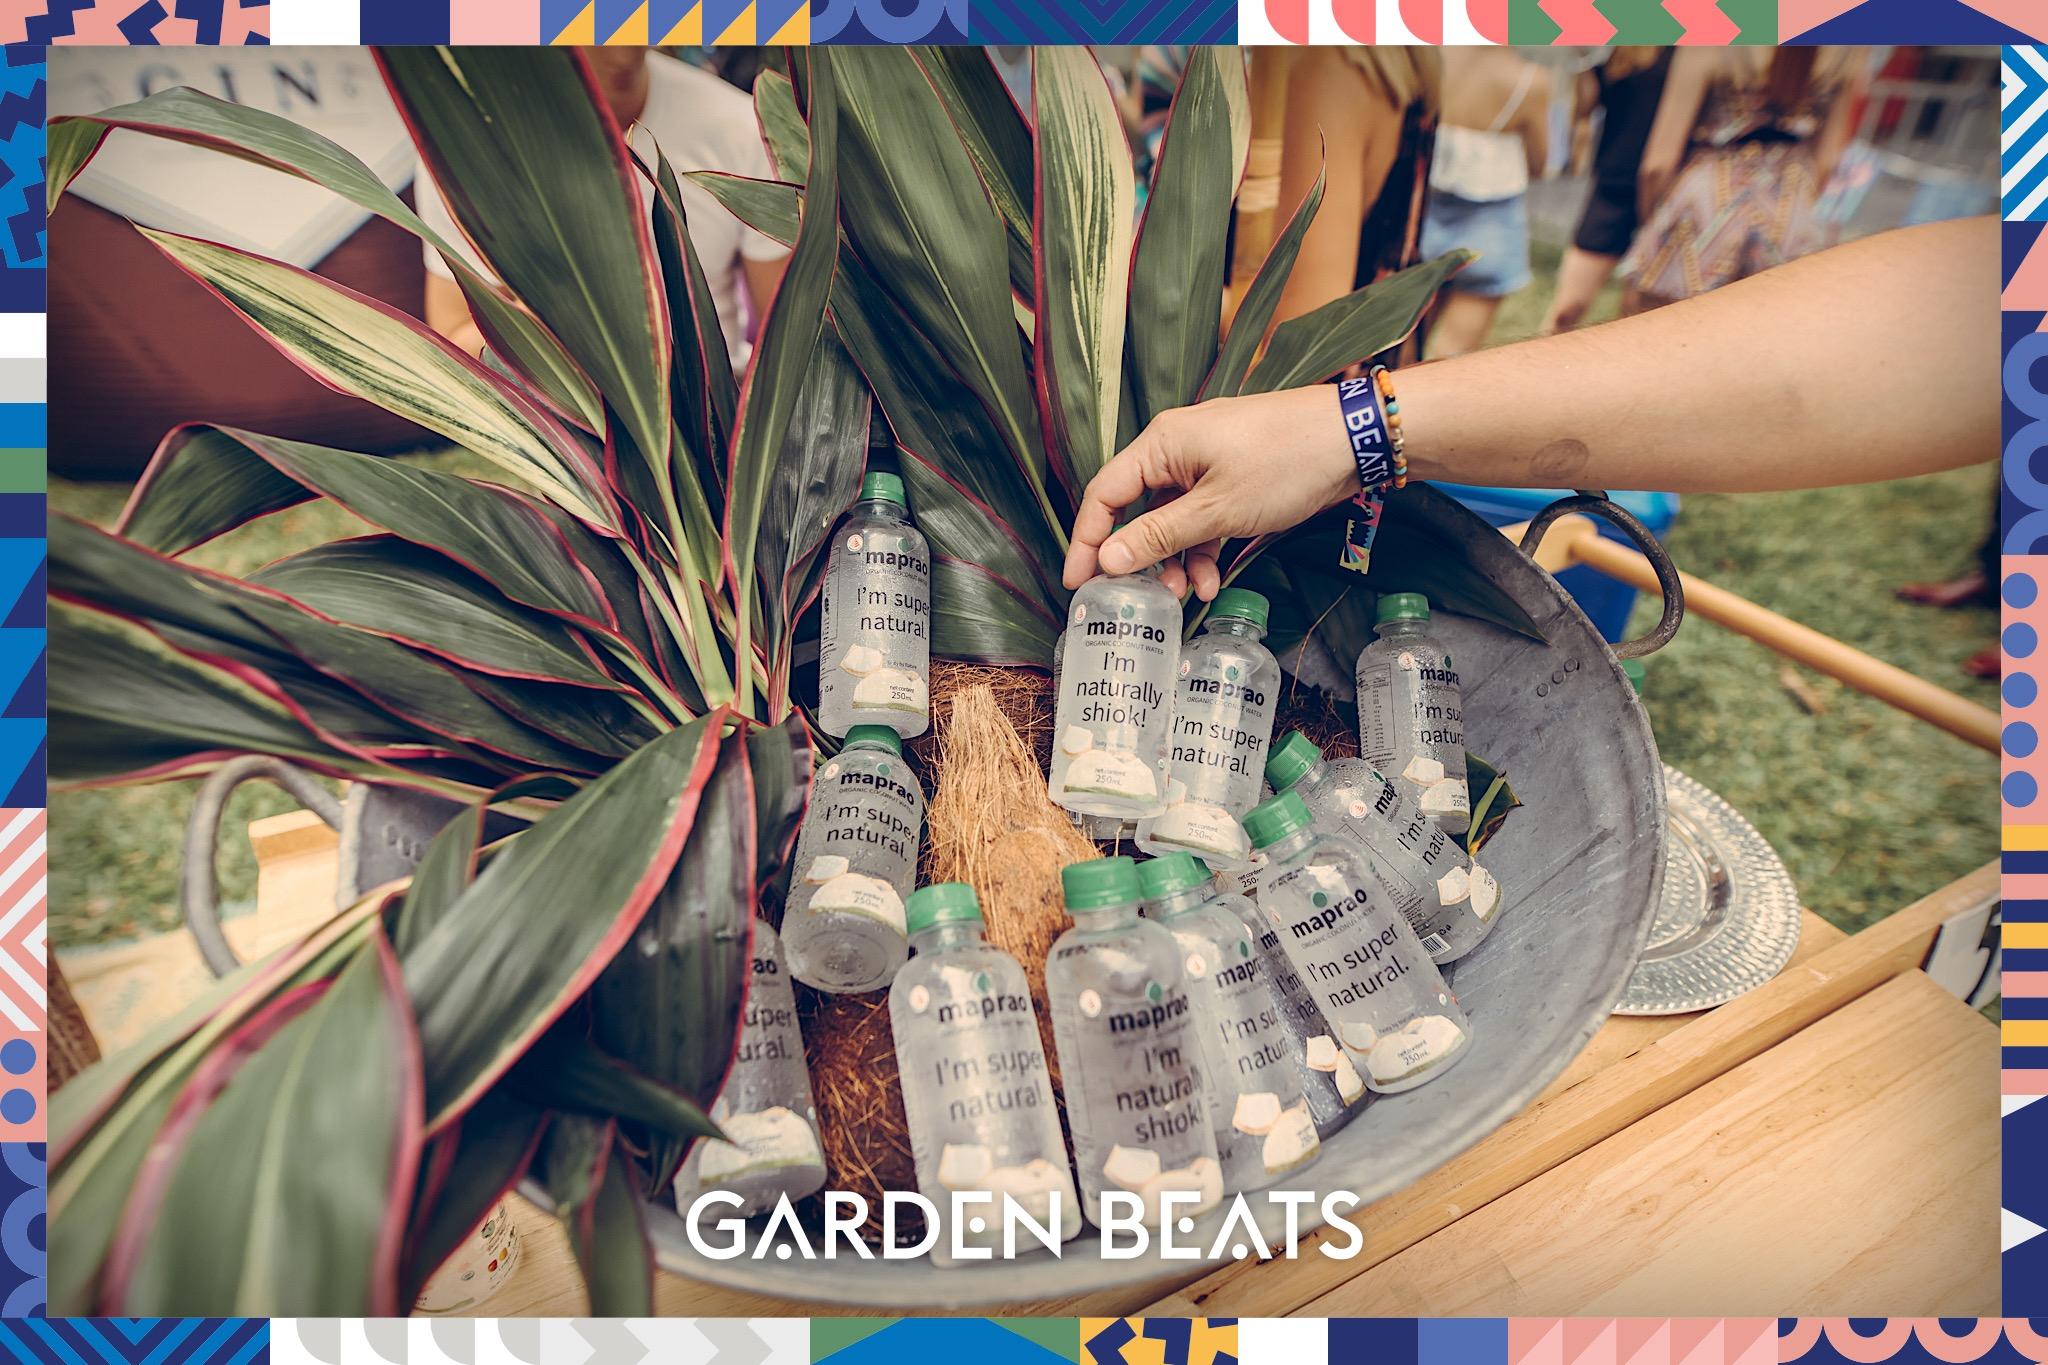 03032018_GardenBeats_Colossal511_Watermarked.jpg